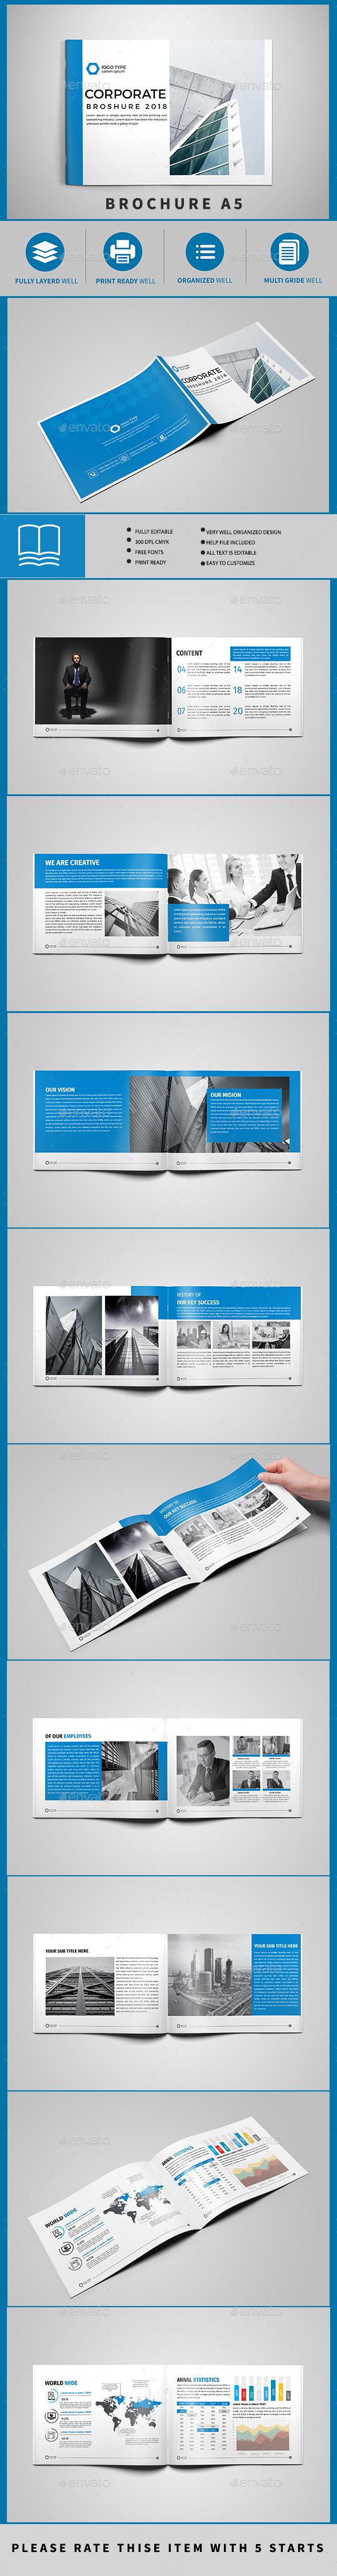 Brochure Template A5 - Brochures Print Templates